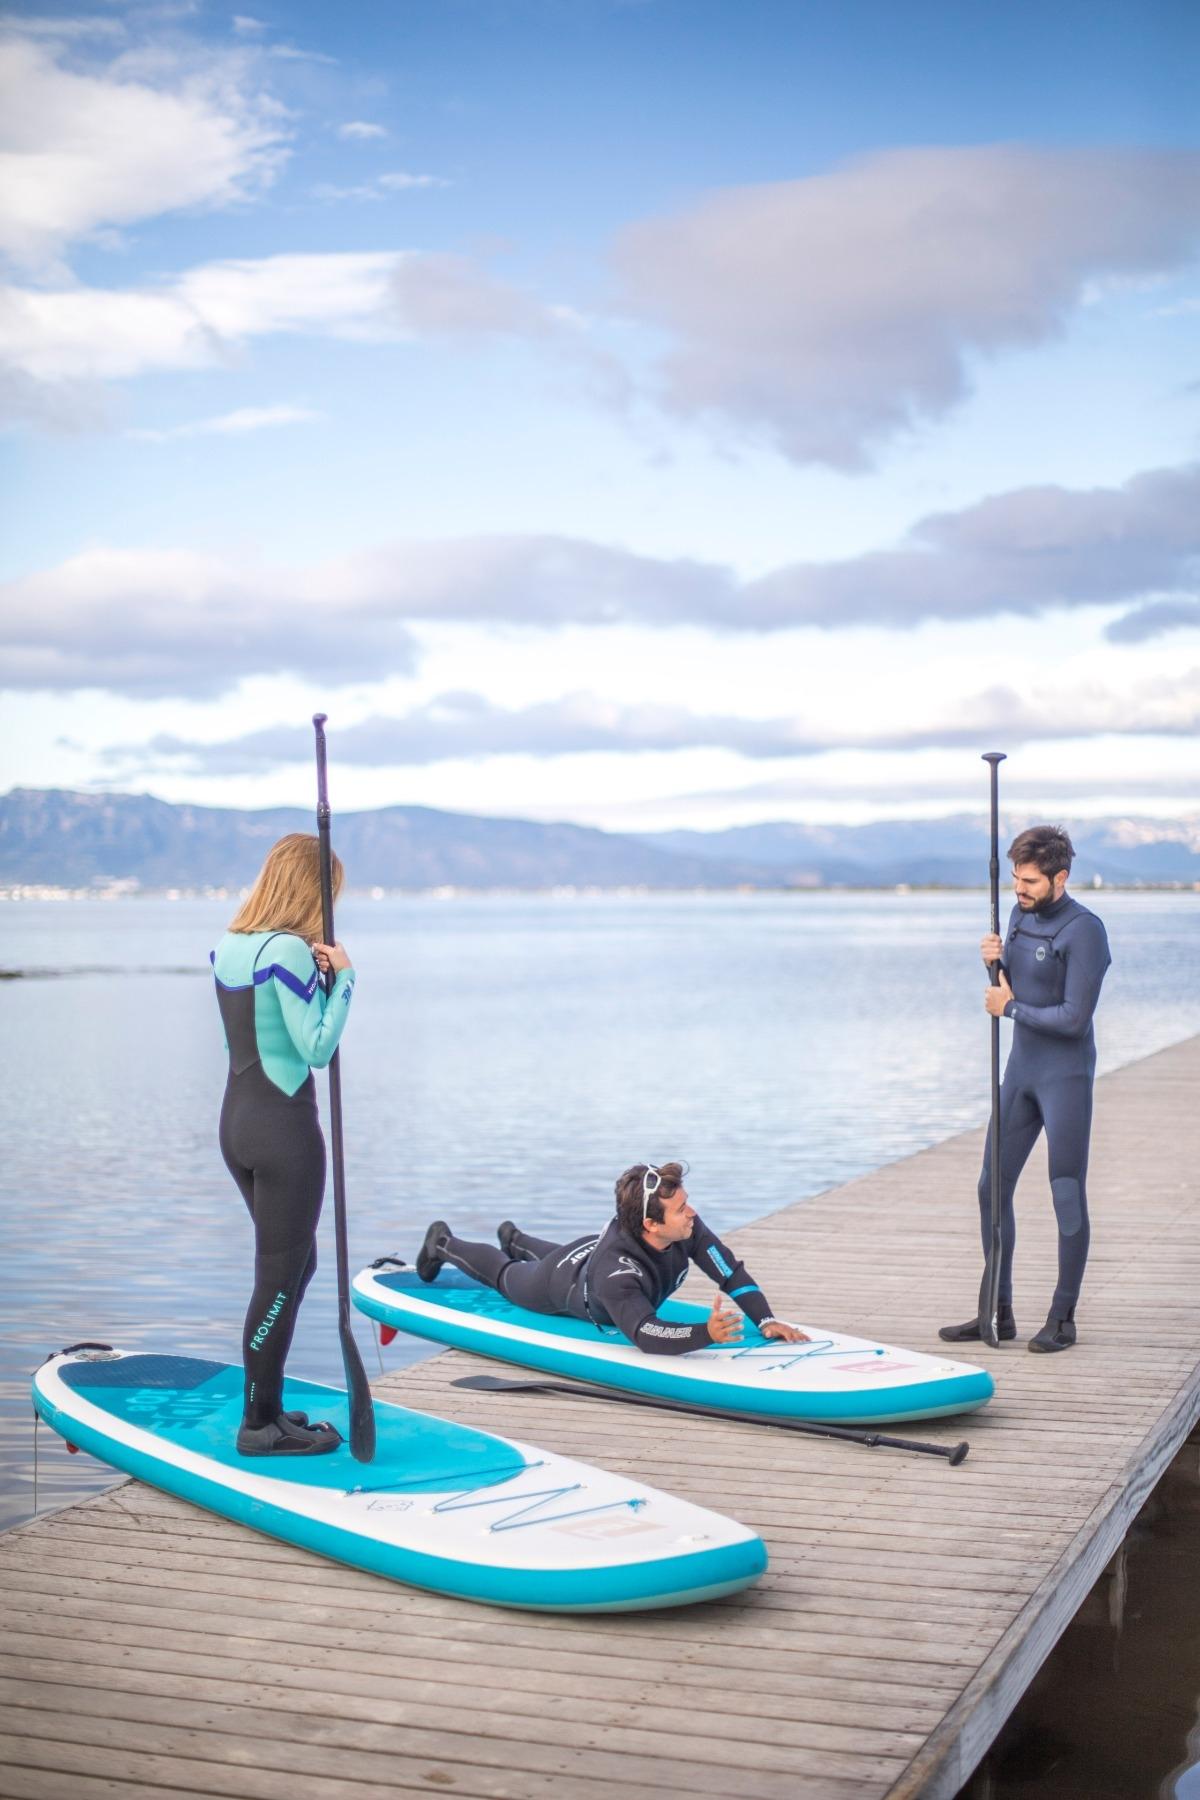 Vora-Vora route with Paddle Surf